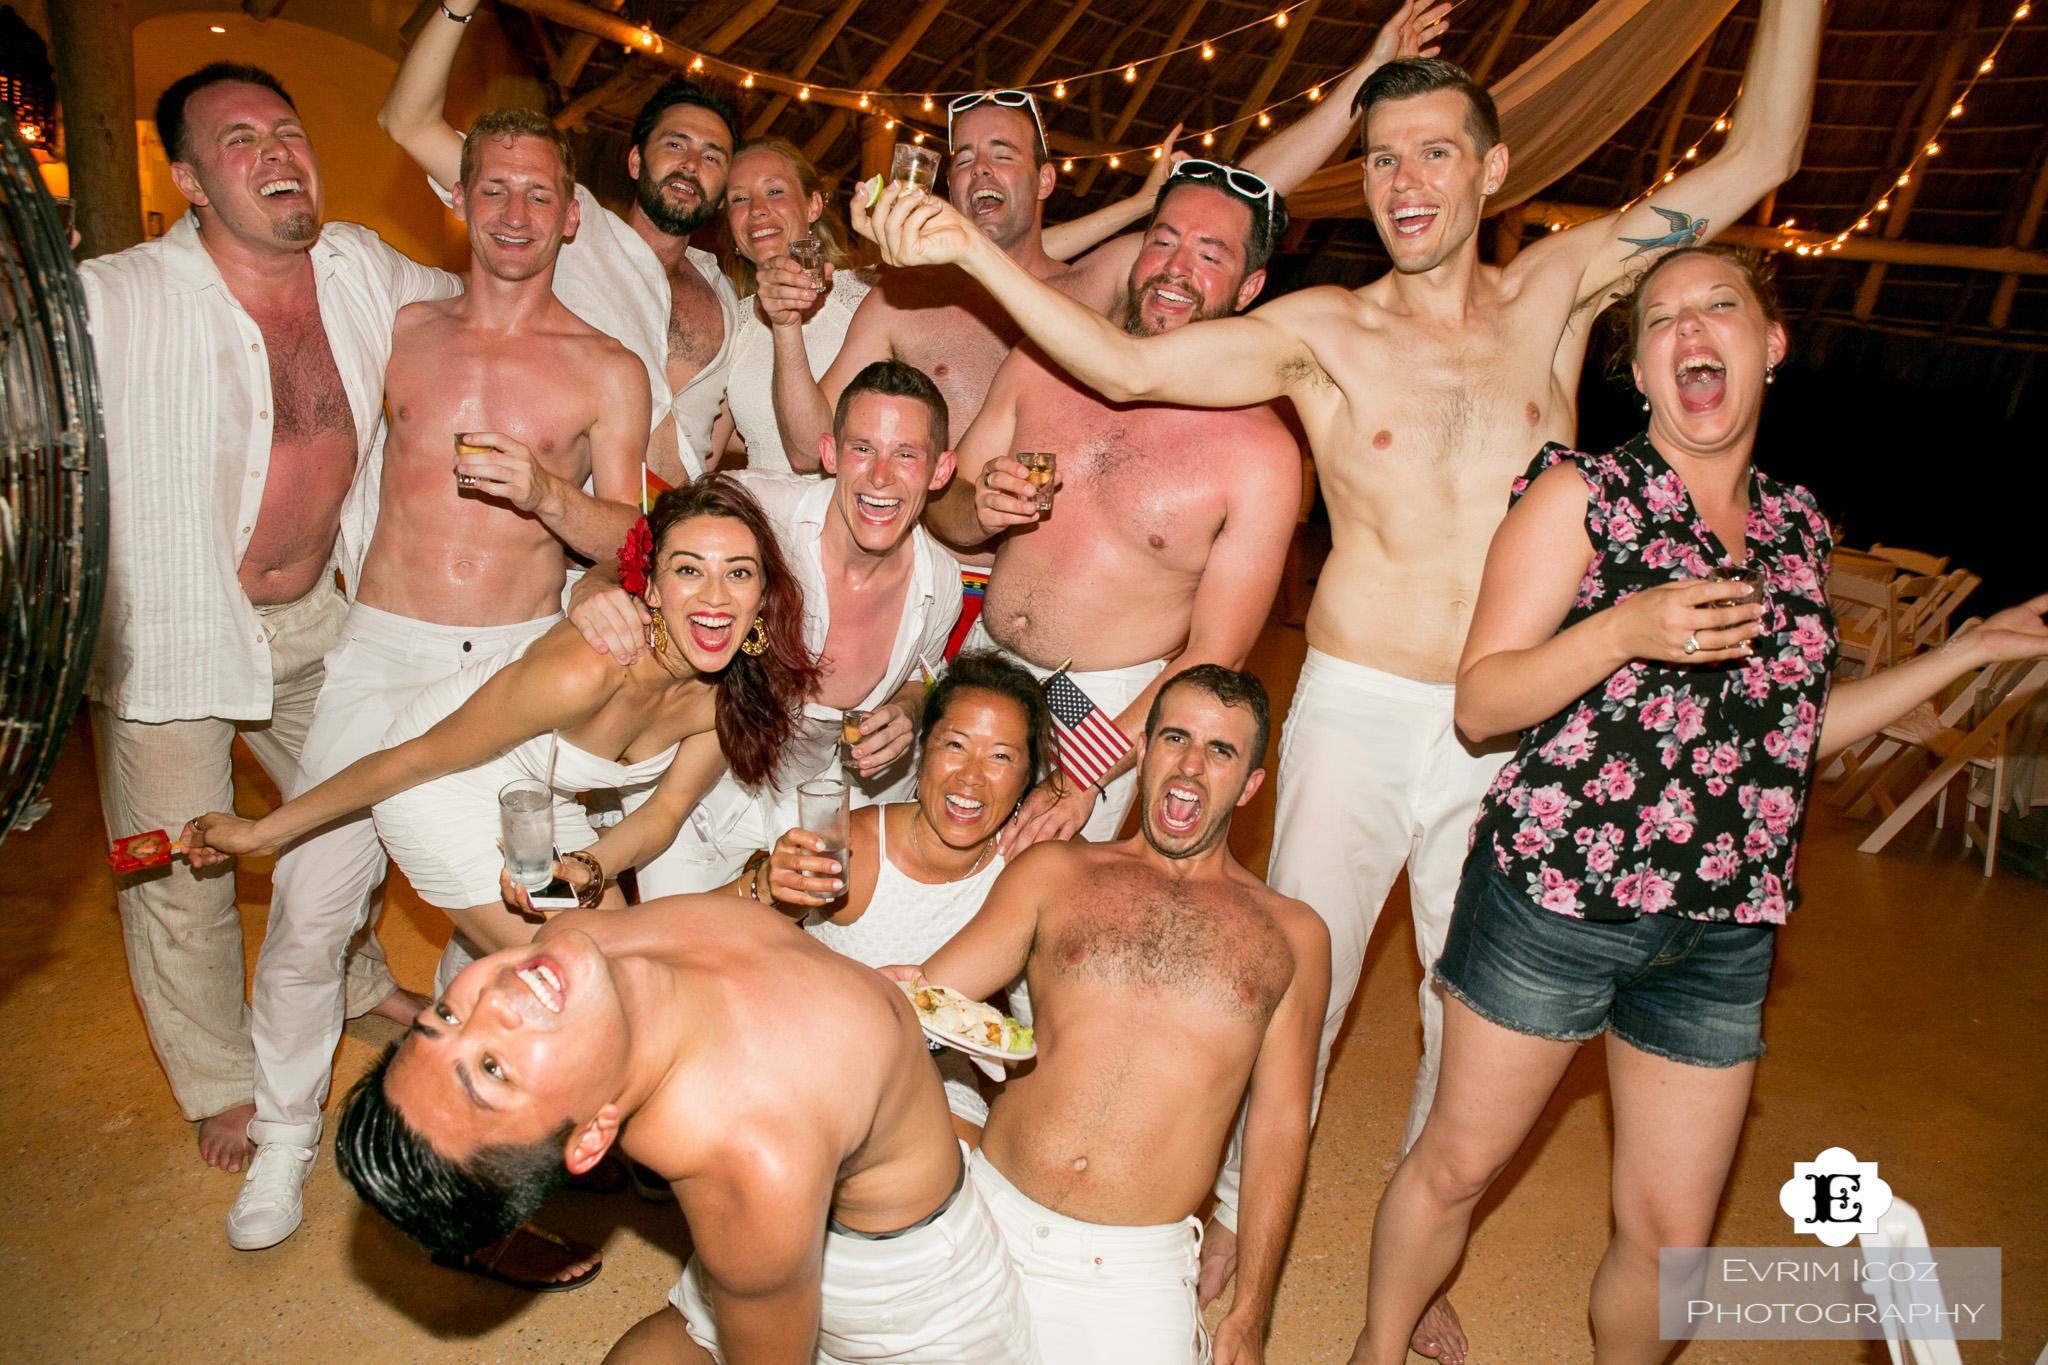 Jefferson + Patrick Wedding July 3 2016 - 9 of 10